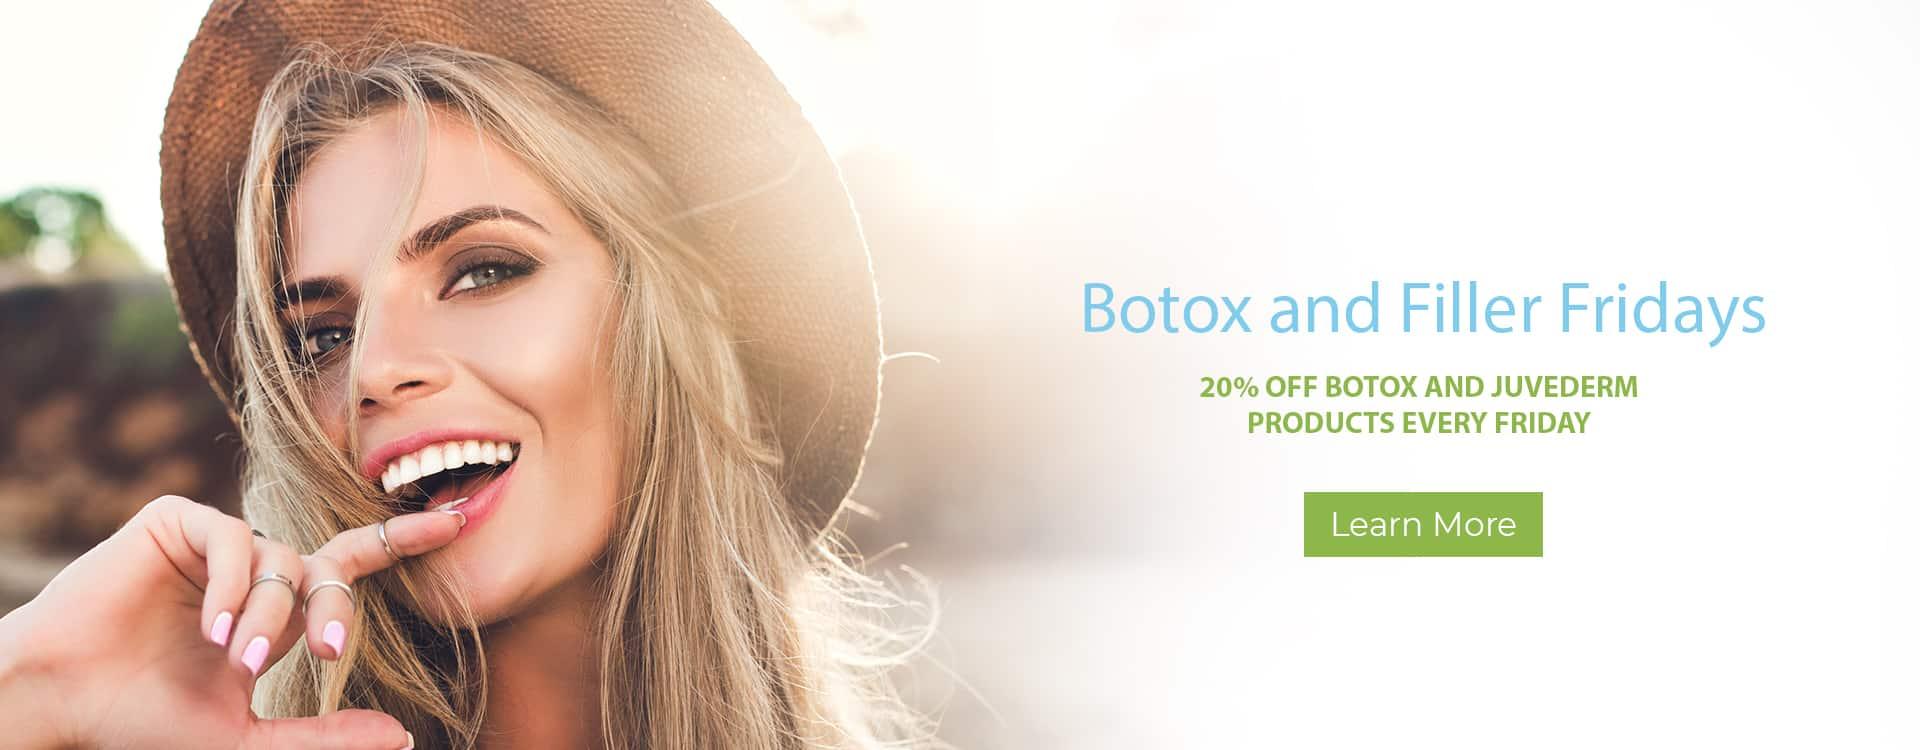 botox-filler-fridays